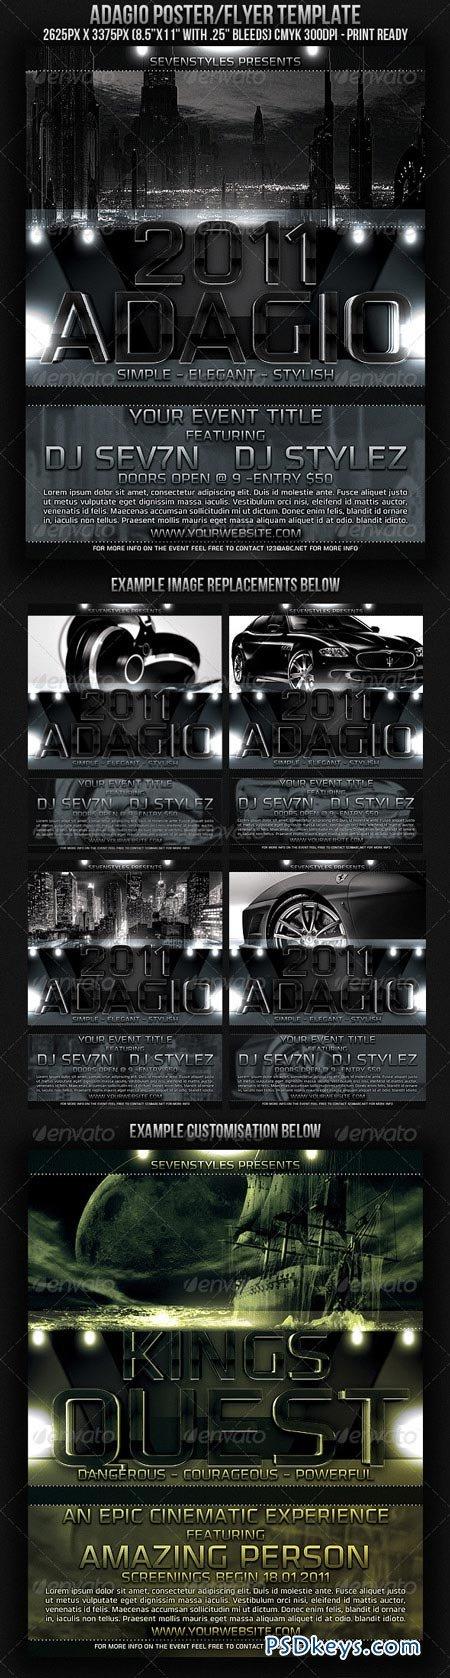 Adagio Poster Flyer Template 151538